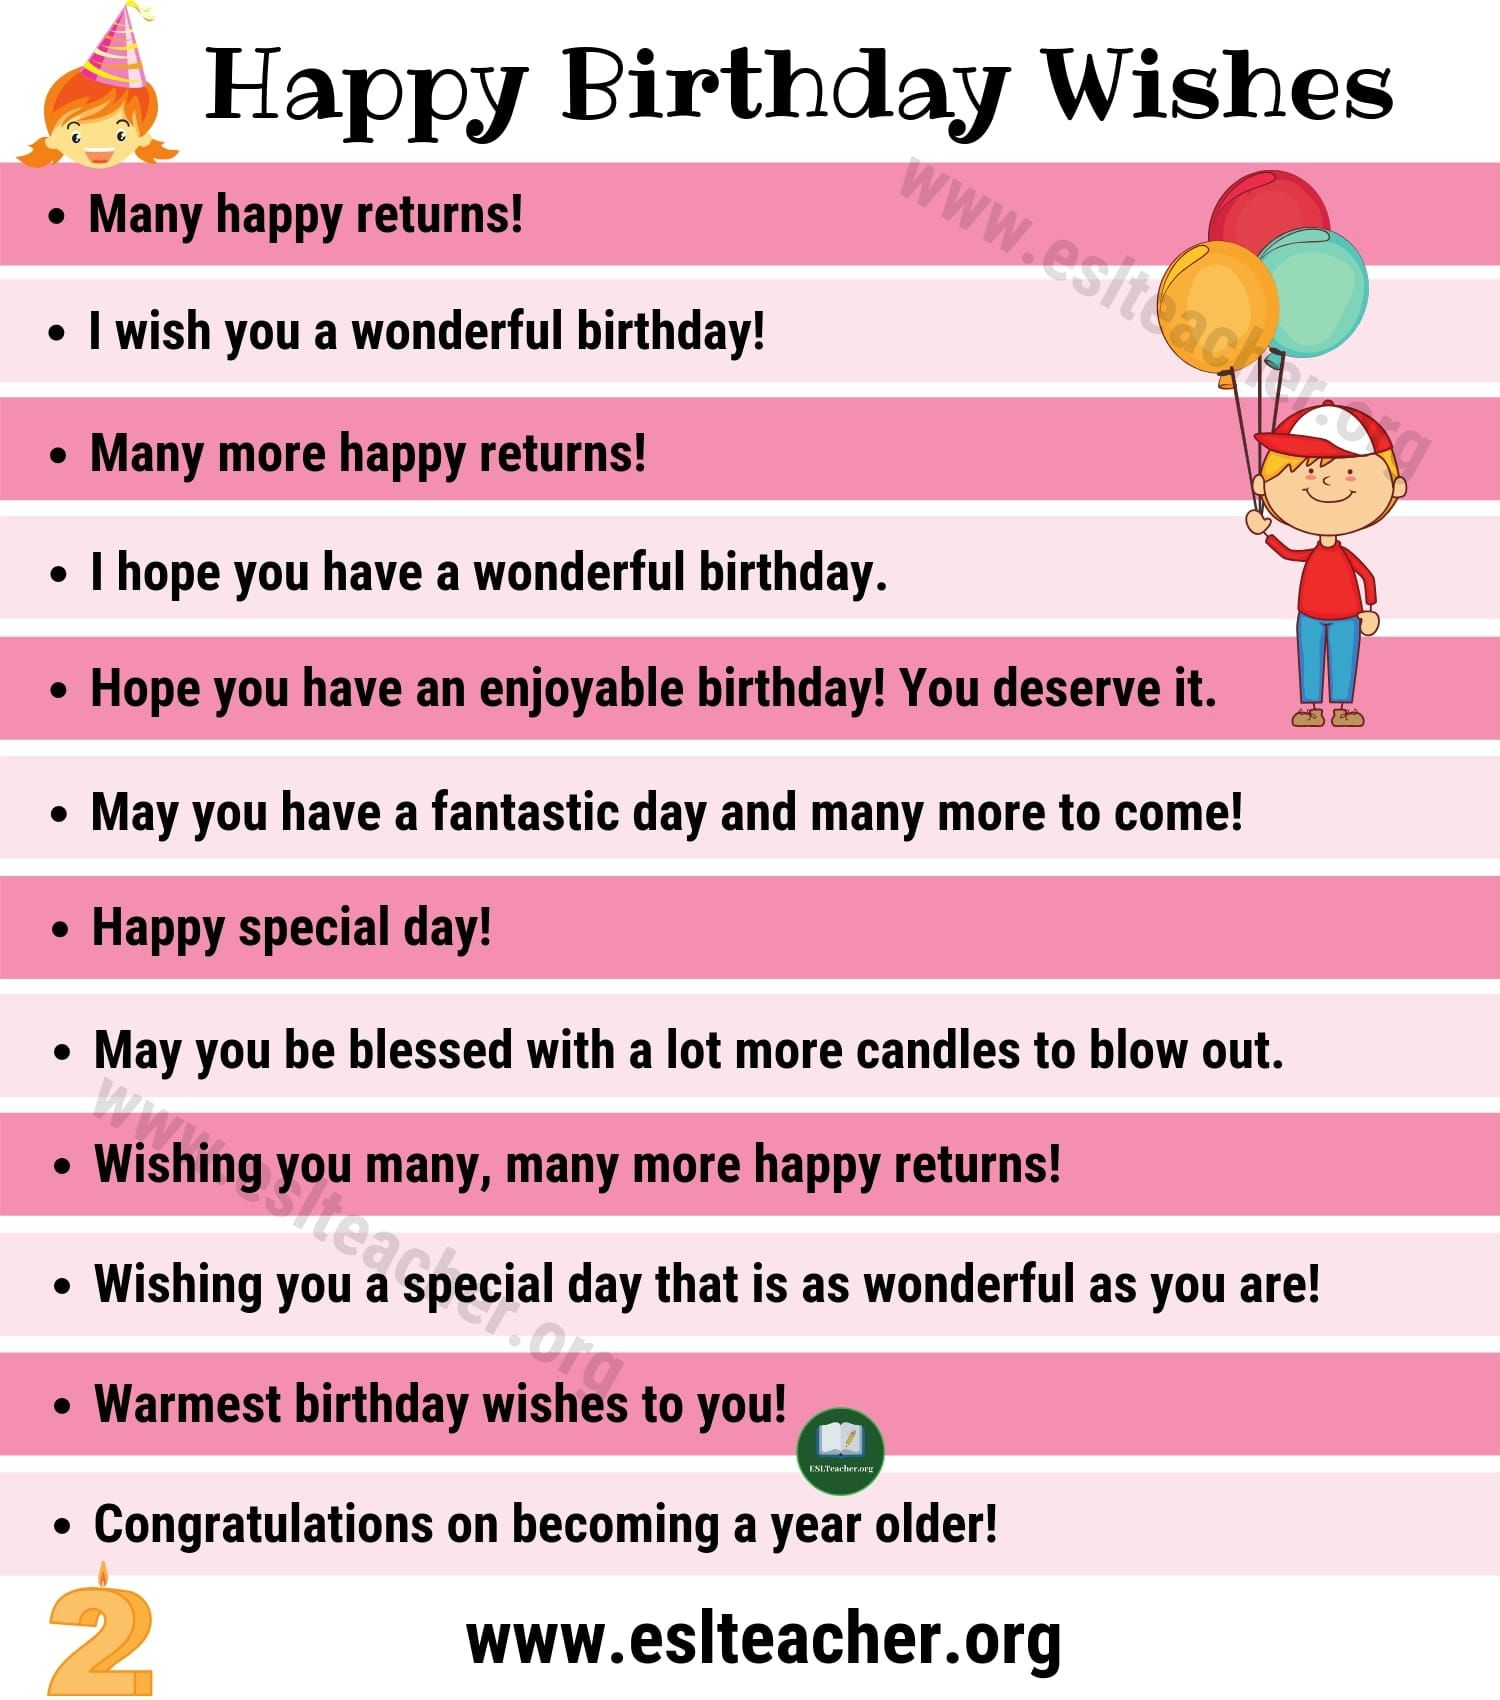 Birthday Wishes 35 Funny Ways To Say Happy Birthday In English Es Happy Birthday Wishes Quotes Happy Birthday Quotes For Friends Birthday Wishes For Teacher